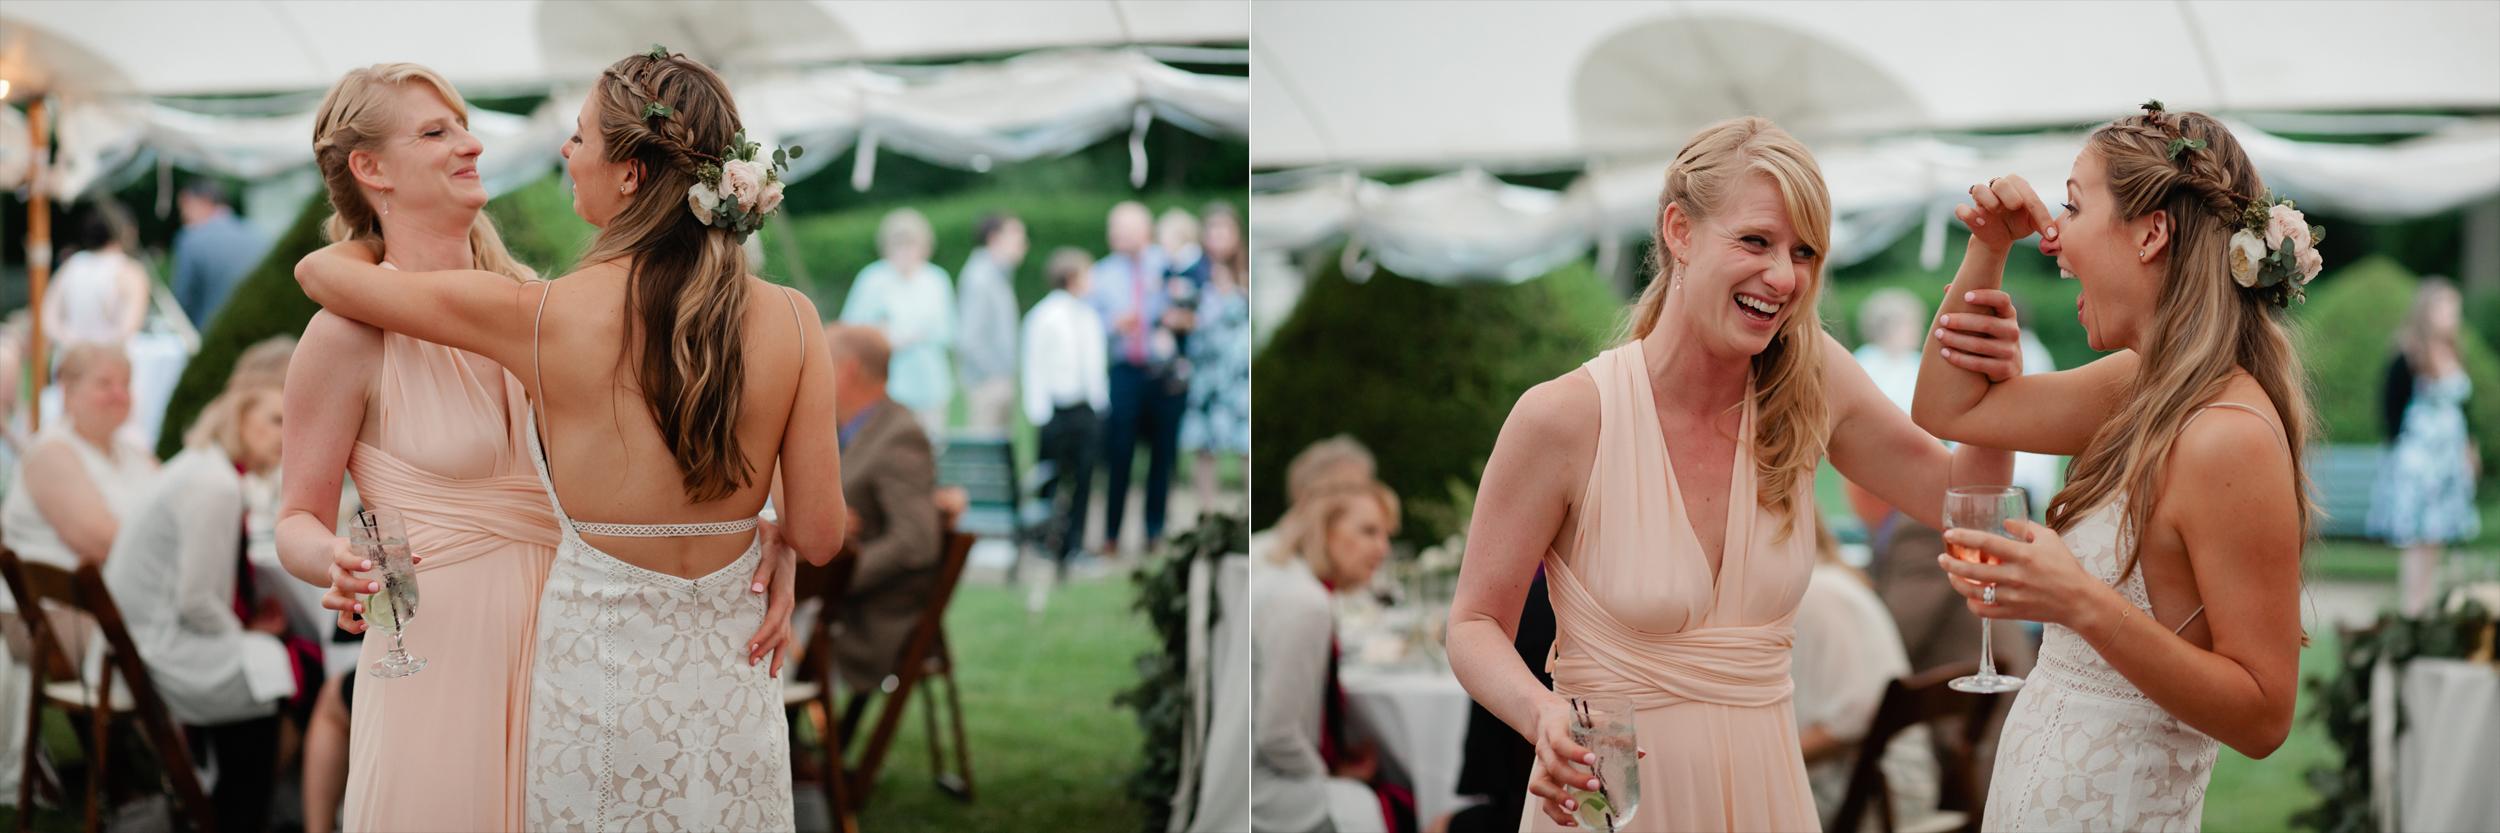 Best-Maine-Wedding-Photographer-1h.jpg